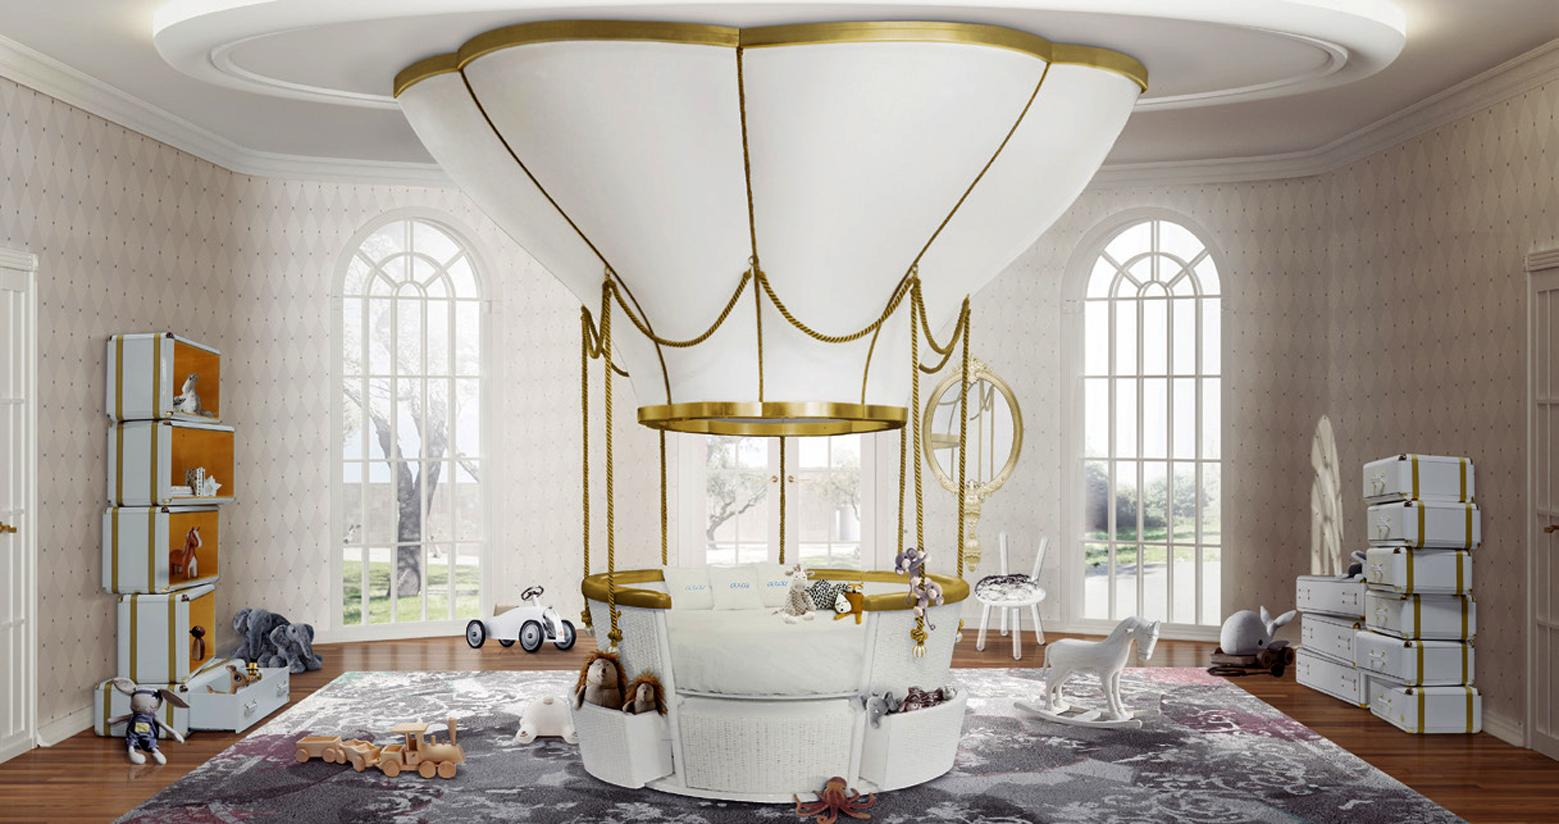 Ordinaire Luxury Ballooning Bed For Children Bedroom Basket Crib Bed U0026 Sofa For Kids  Room